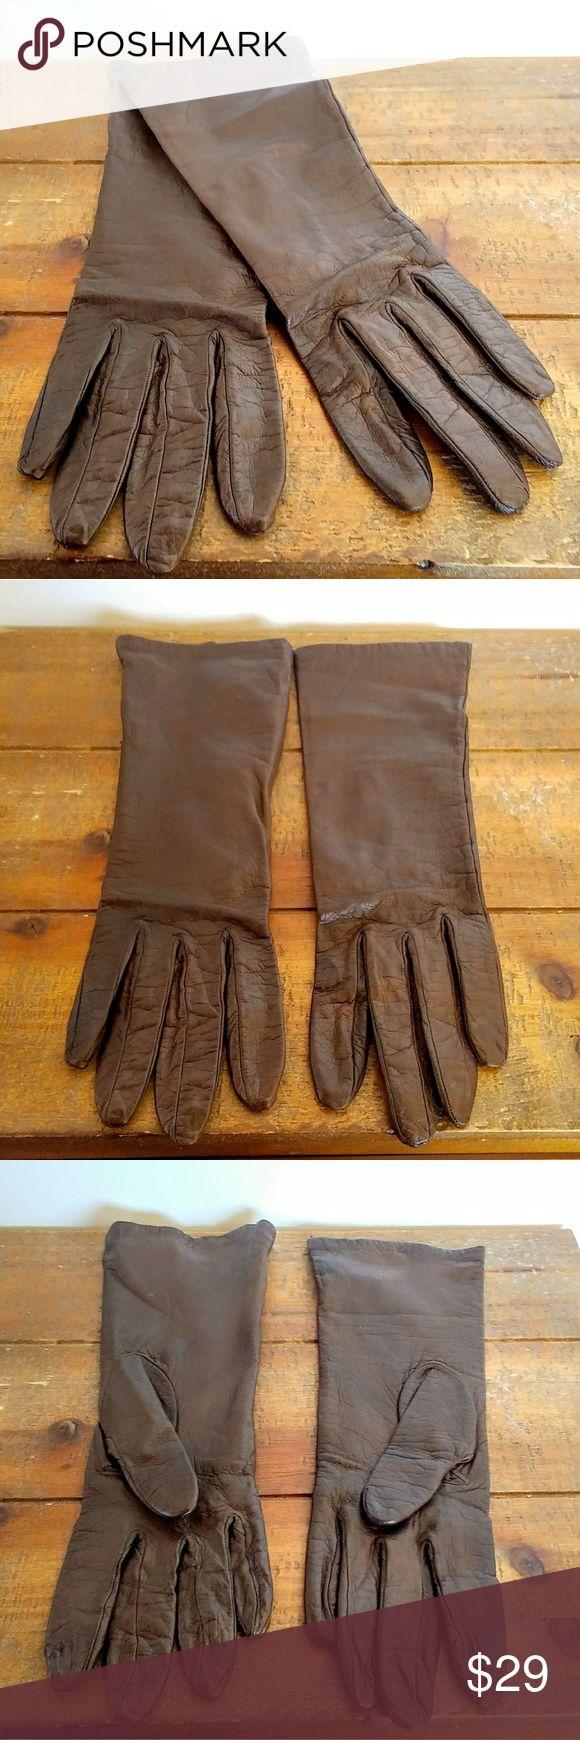 Leather driving gloves vancouver - Vtg Chevreal Garanti Soft Leather Gloves